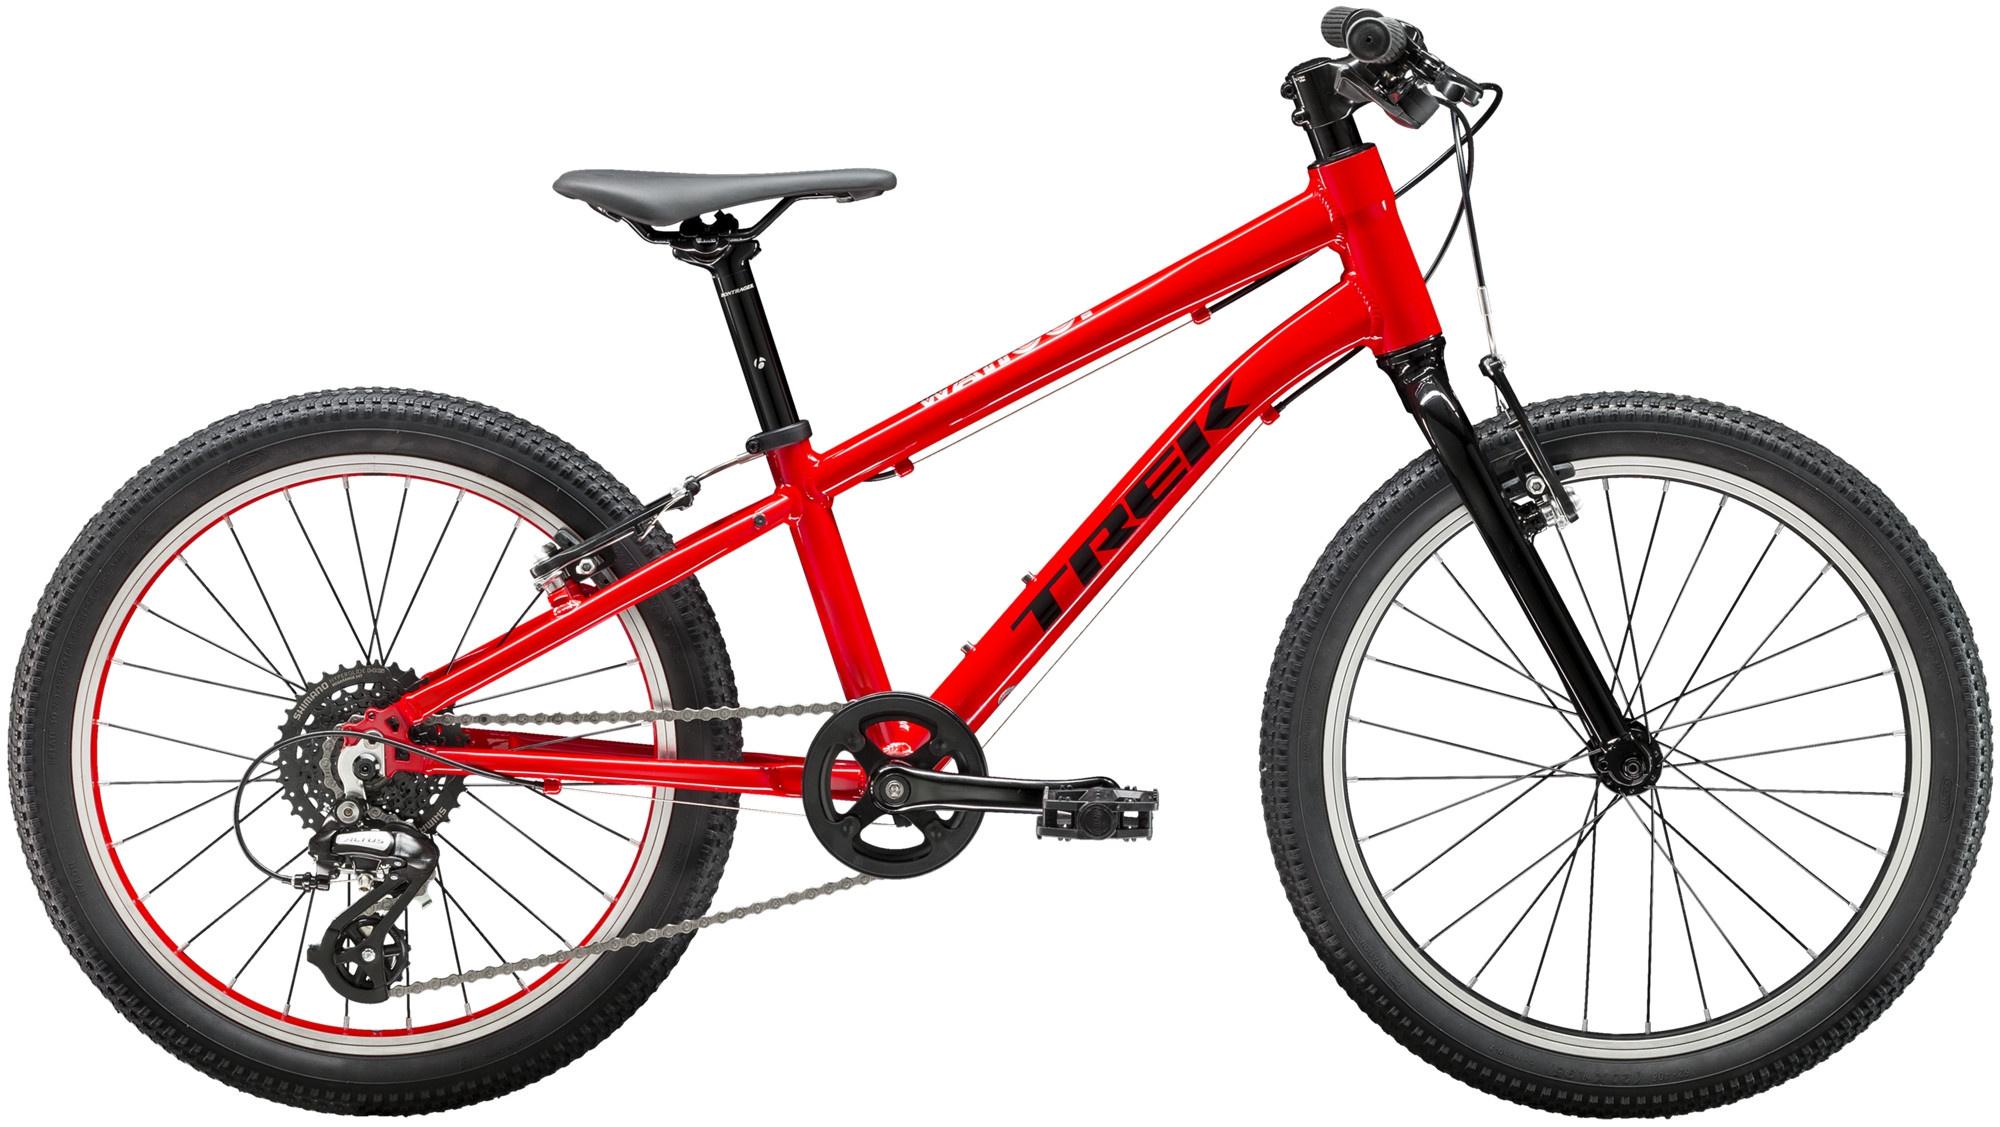 Trek Wahoo 20 Kids Bike 2020 Viper Red/Black